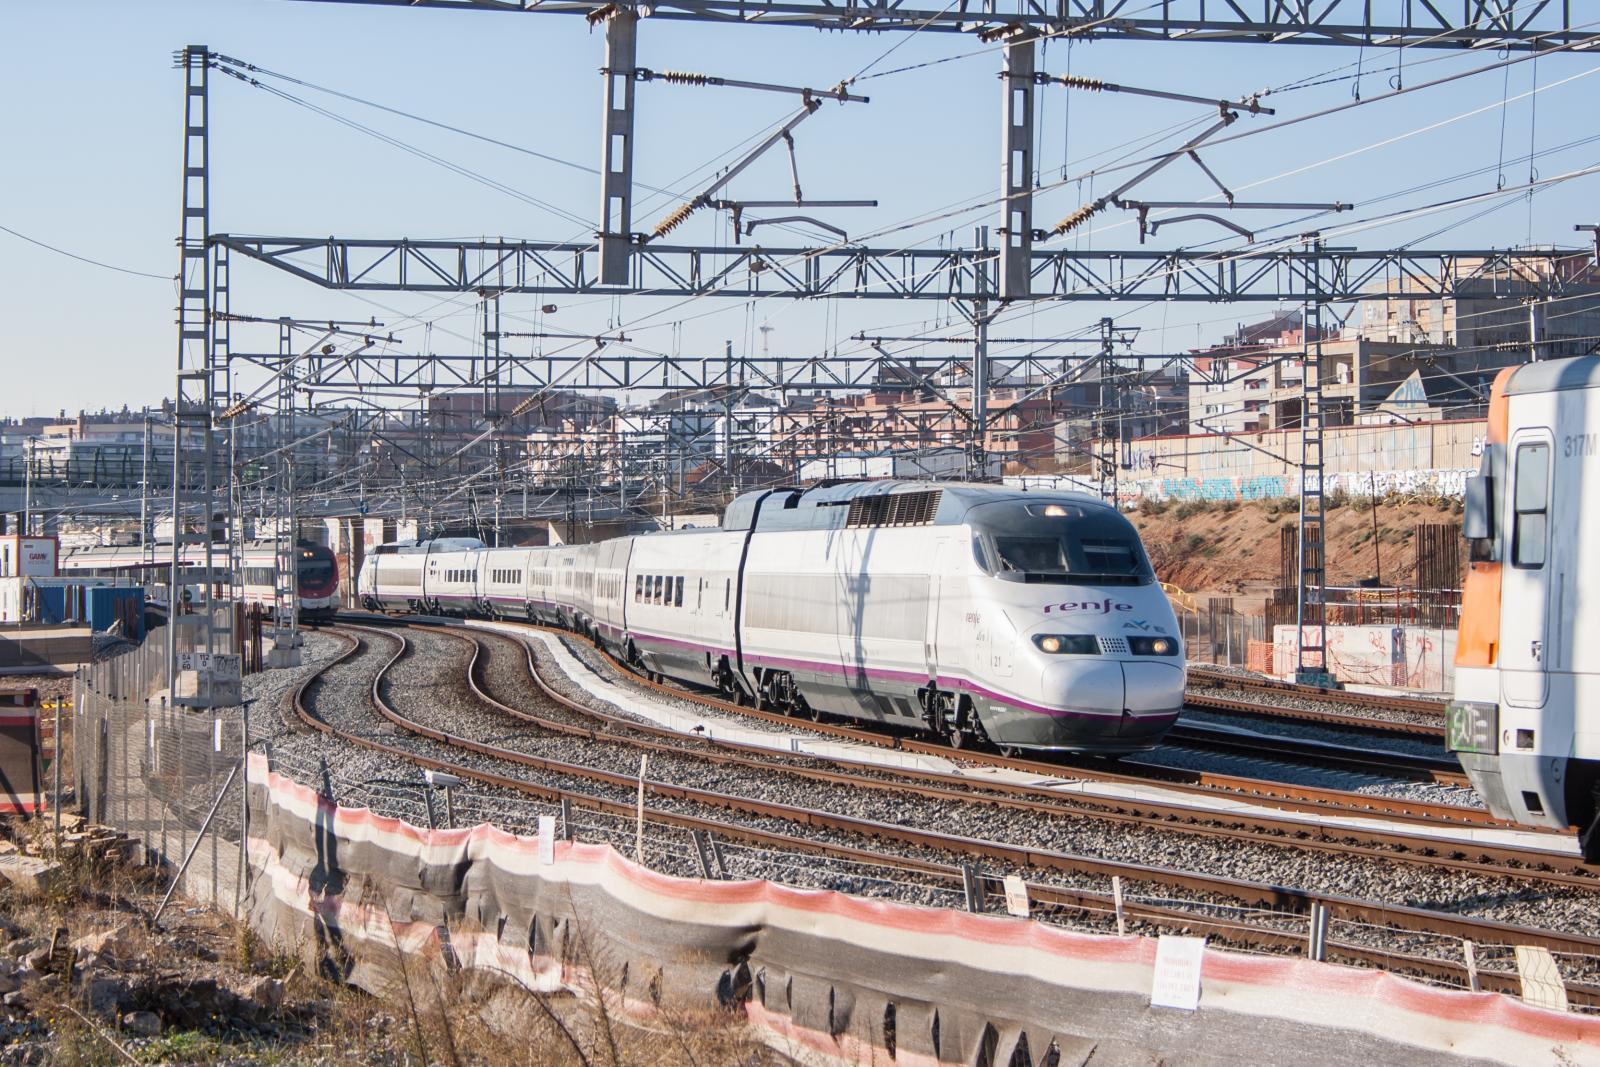 Tren de alta velocidad de la serie 100 de Renfe-Operadora en La Sagrera. Foto: evarujo.